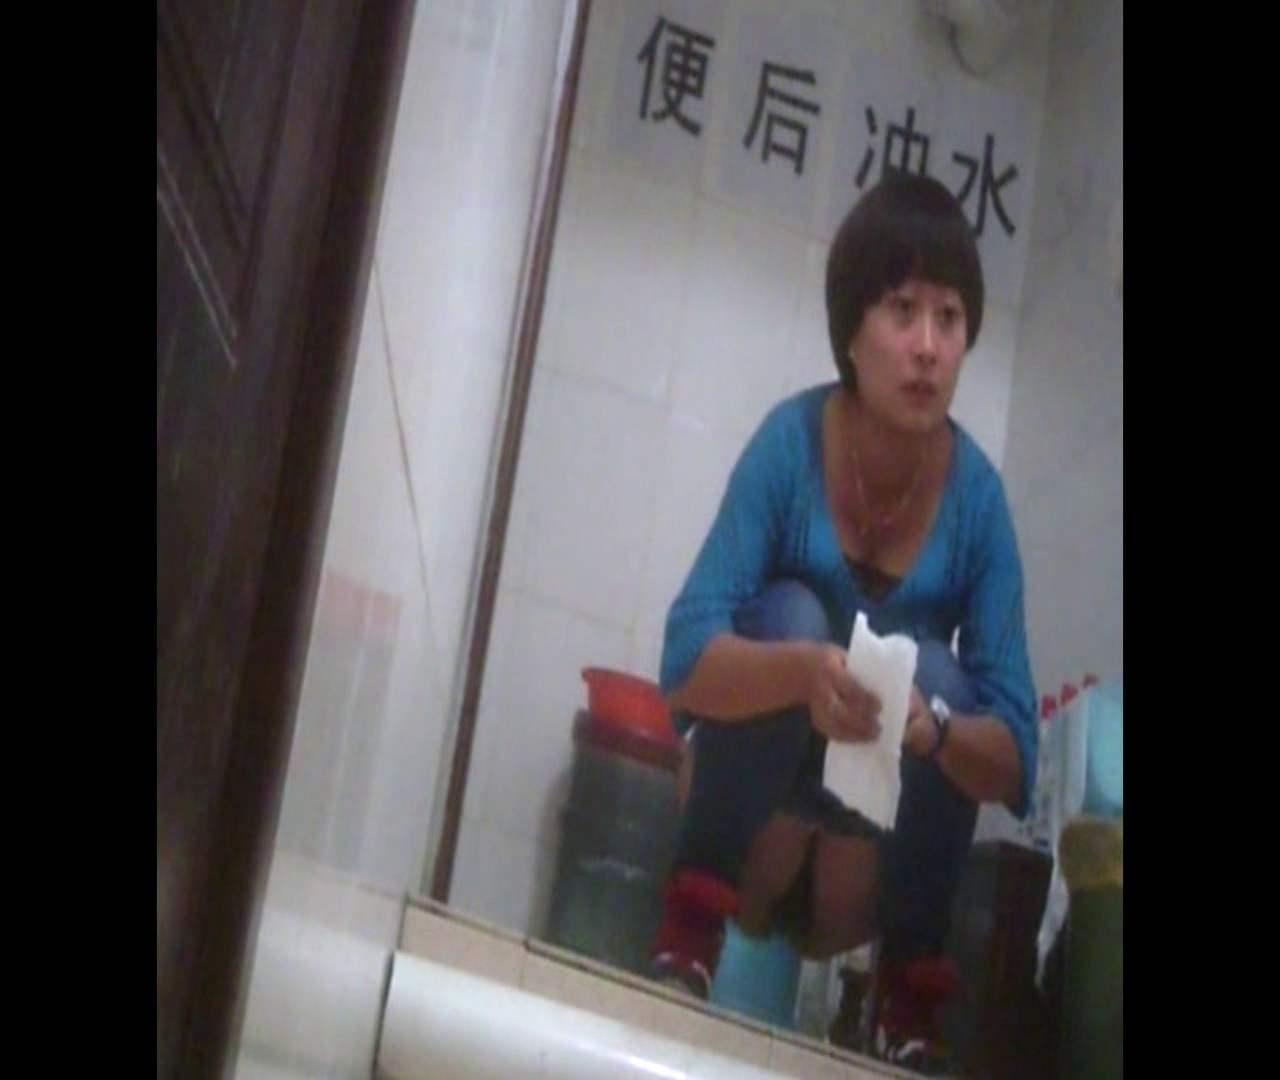 Vol.37 豊満な胸を持つマッシュルームカットな彼女 洗面所 | 丸見え  63画像 31